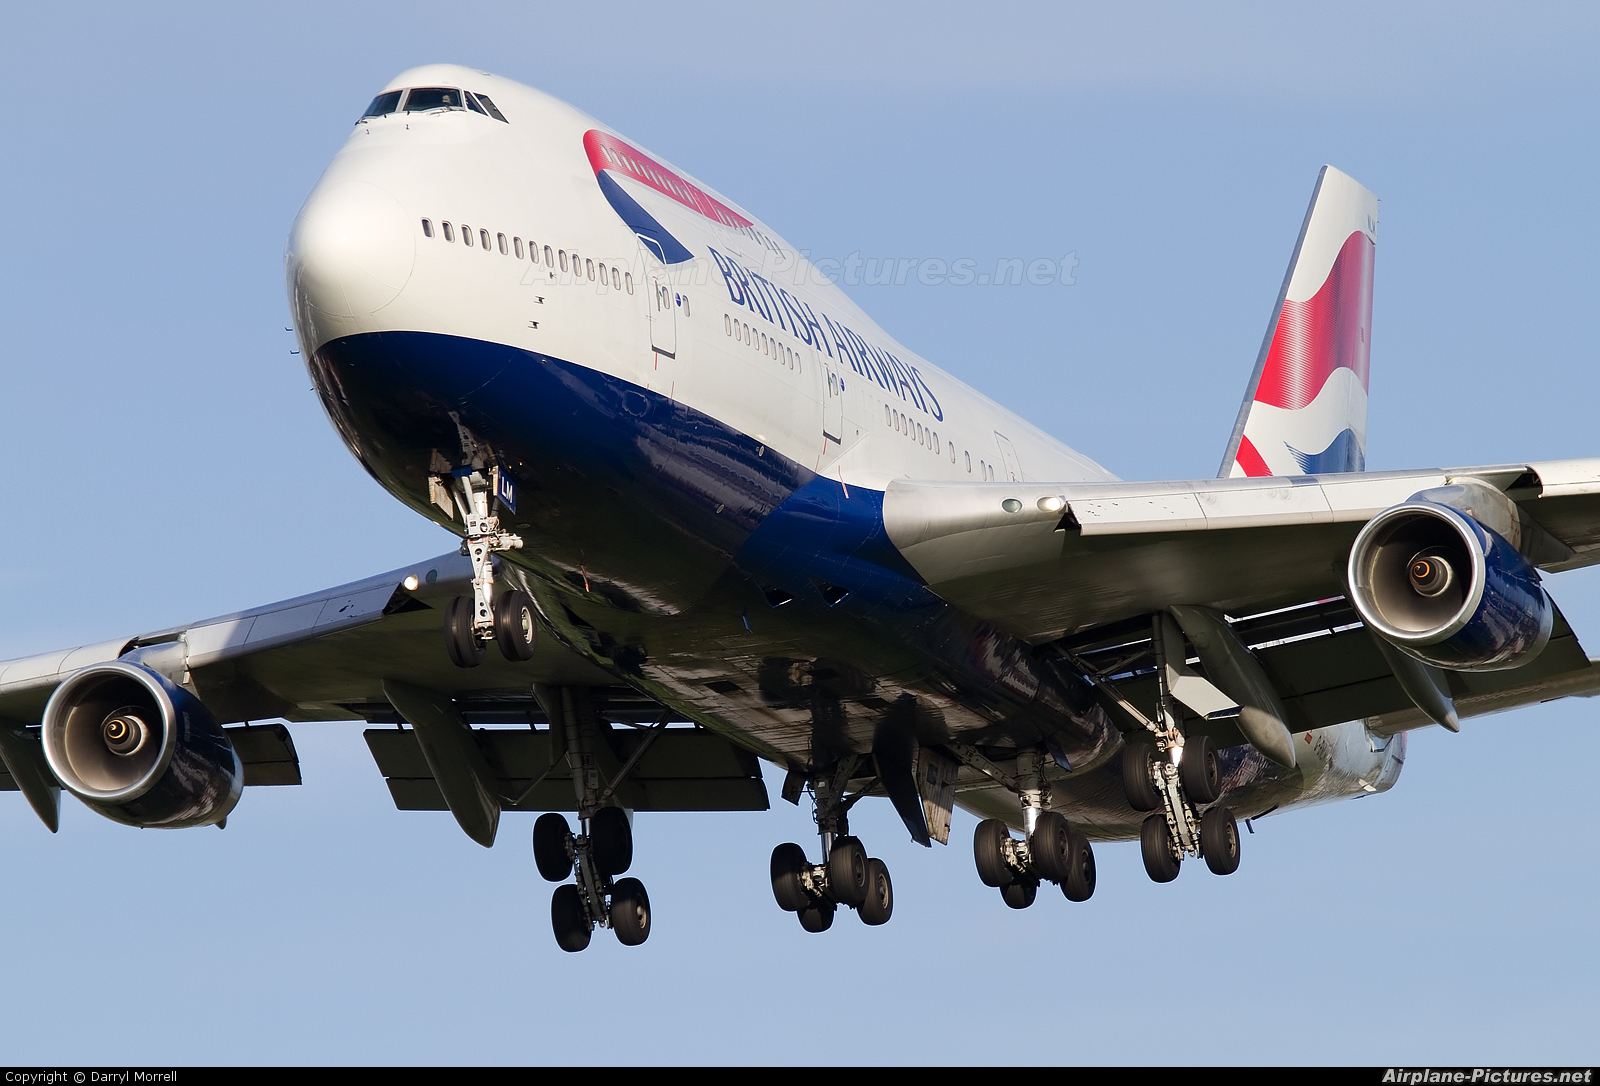 British Airways G-BNLM aircraft at London - Heathrow